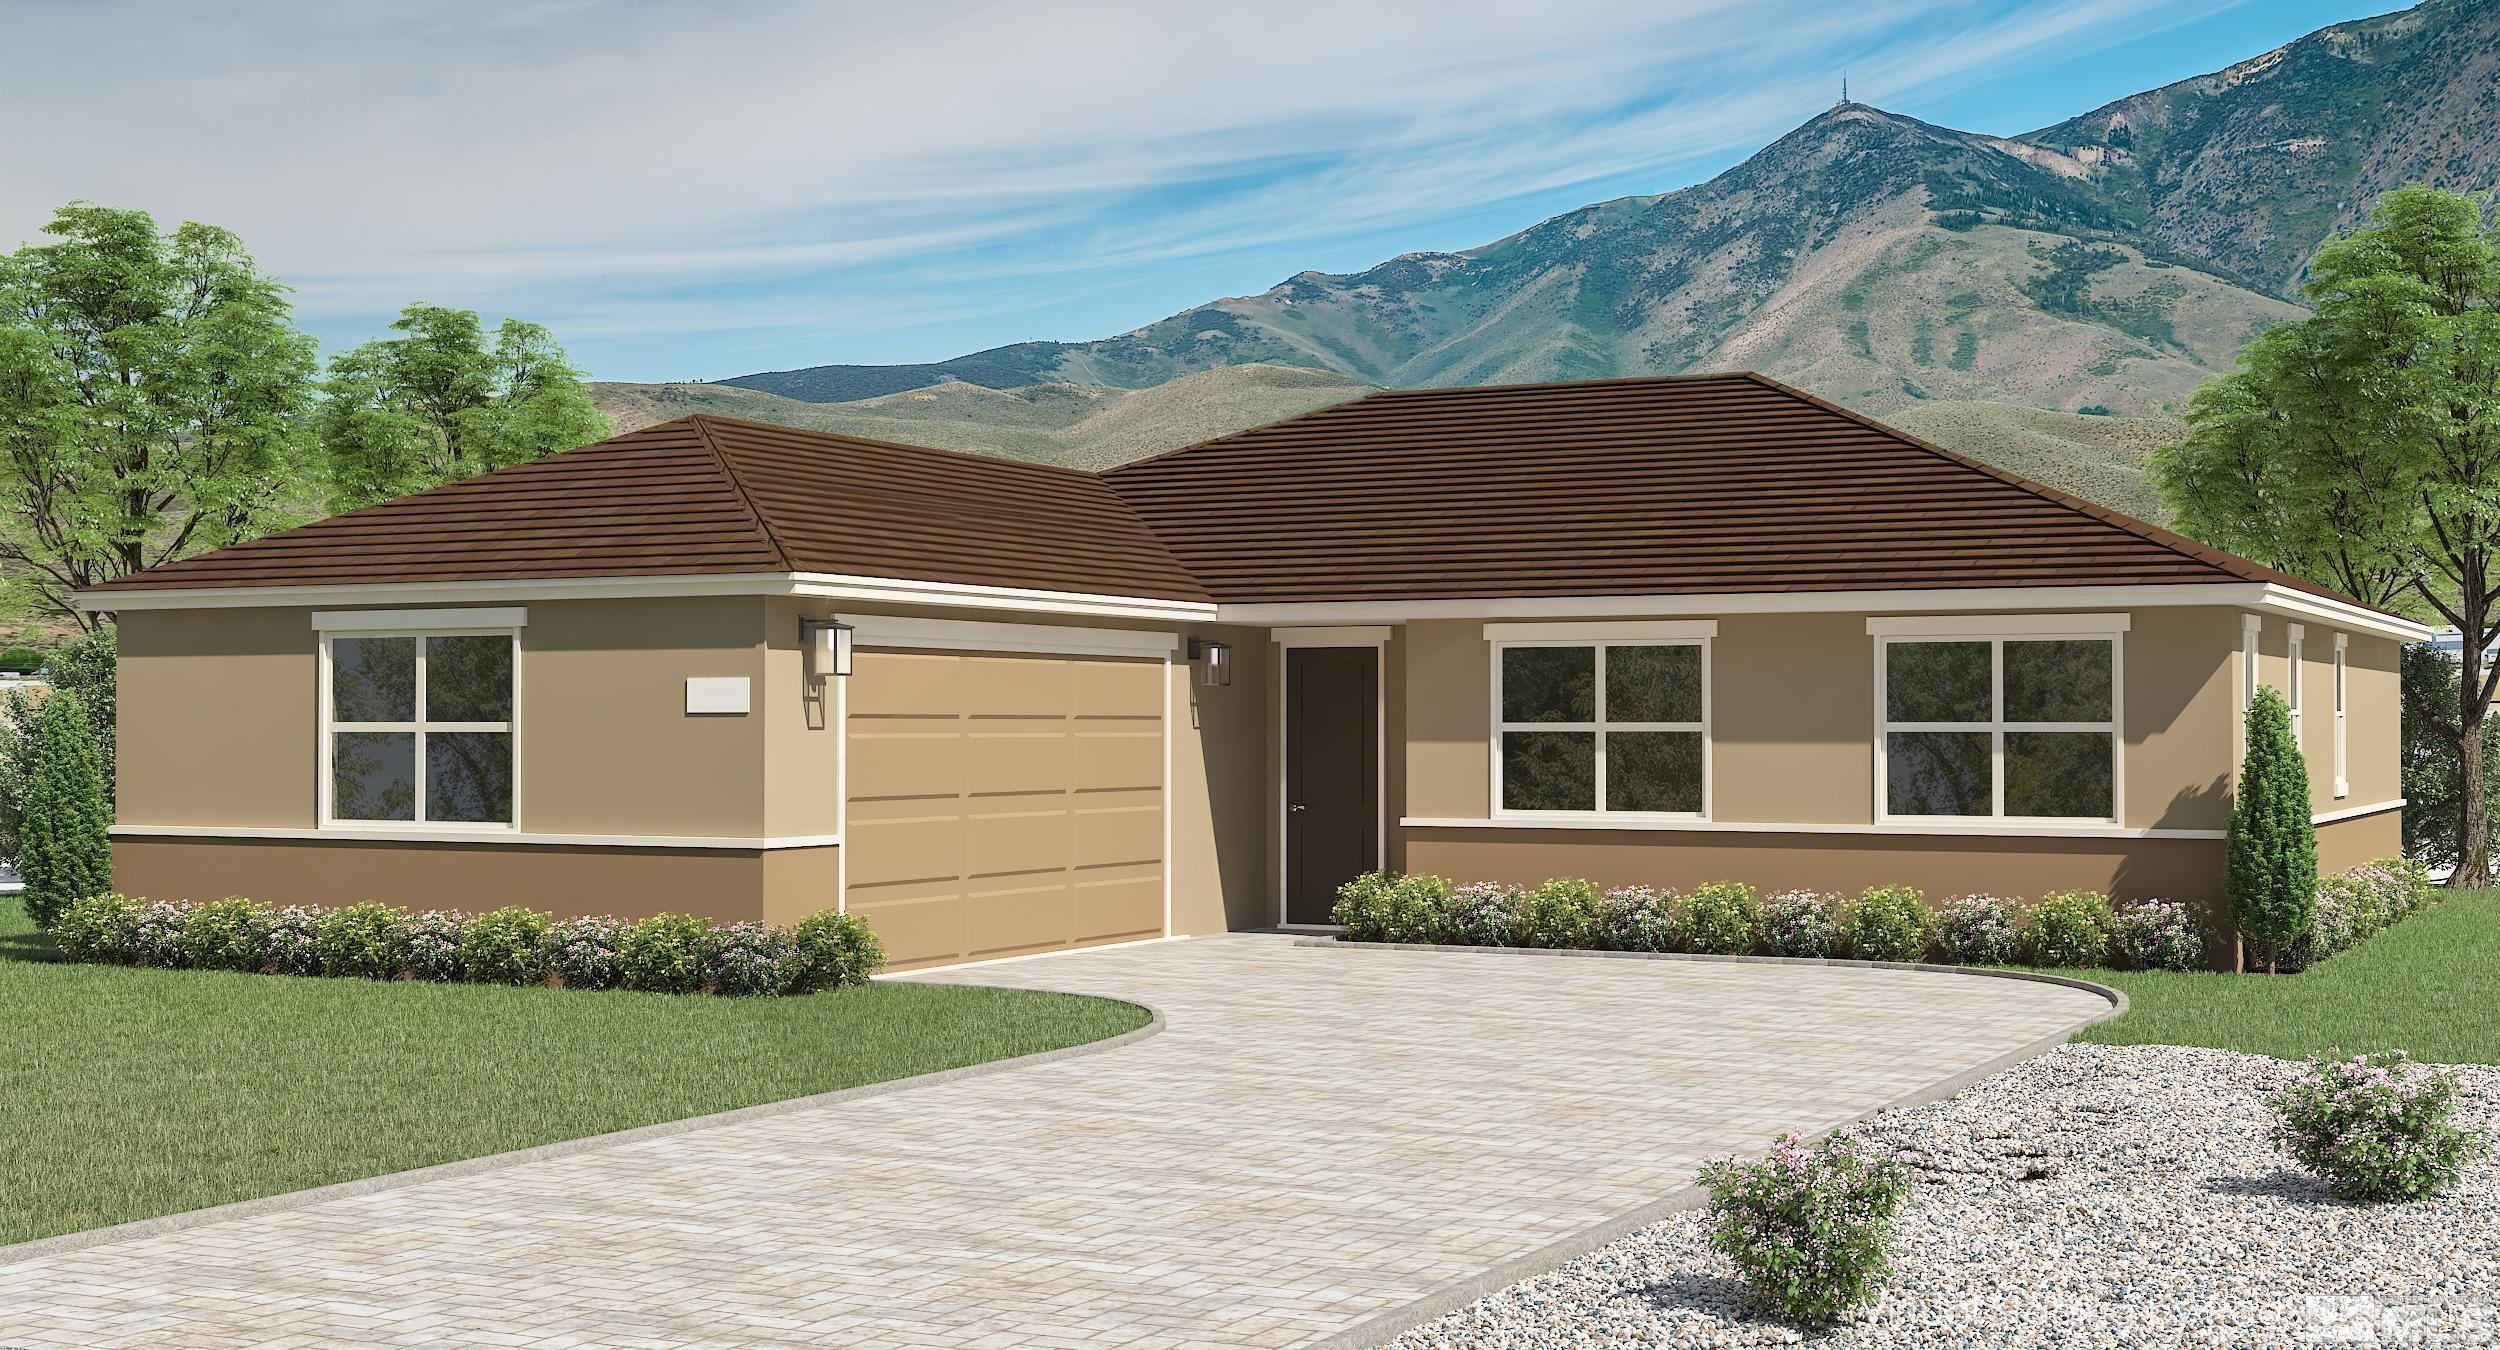 Image for 7636 Arya Ct., Reno, NV 89506